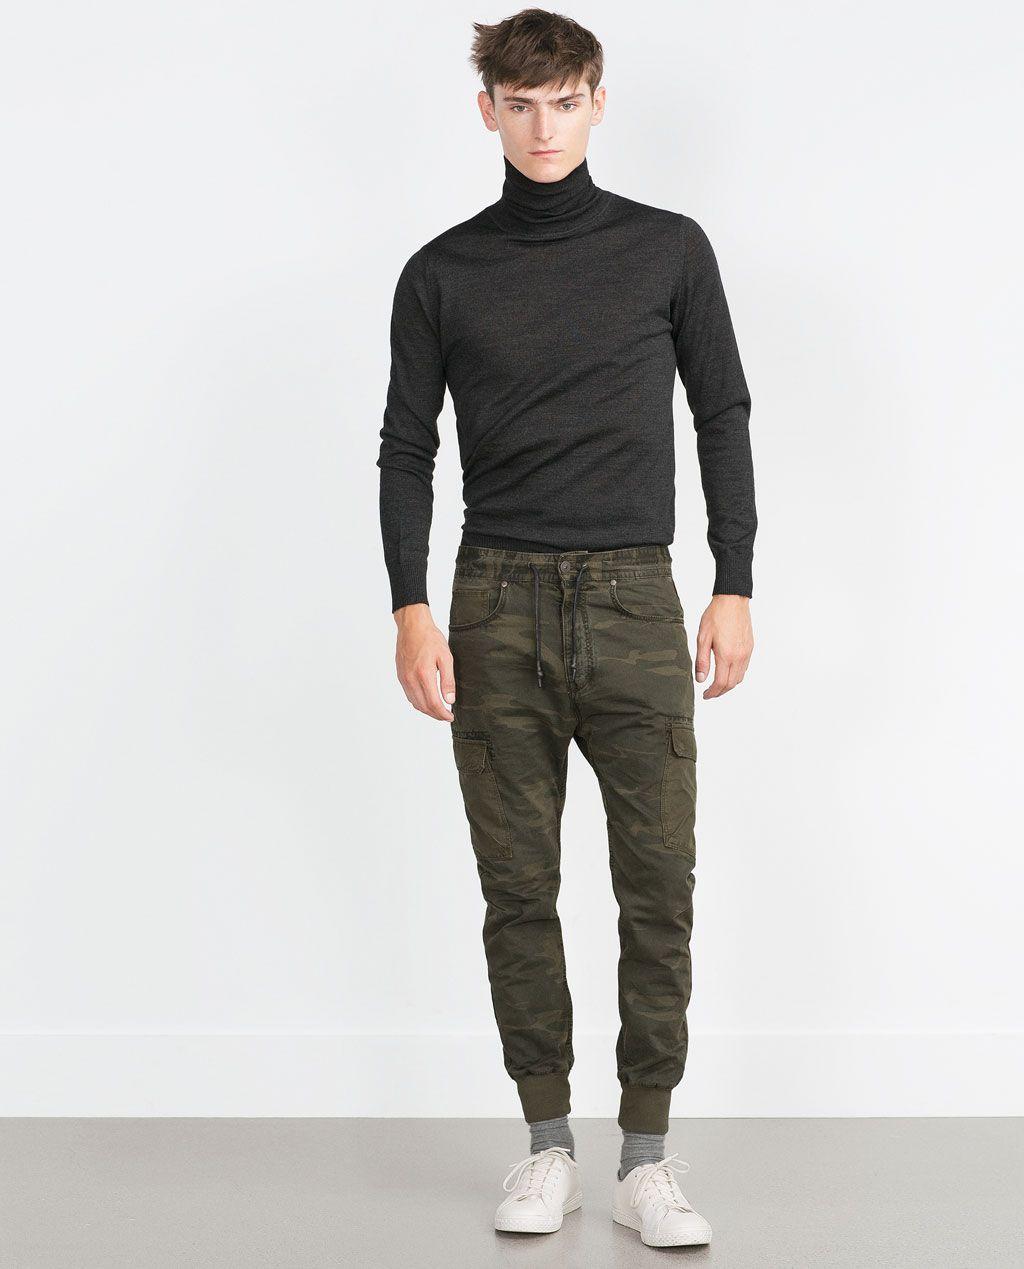 ZARA - MAN - CARGO TROUSERS | Pantalones, Zara hombre